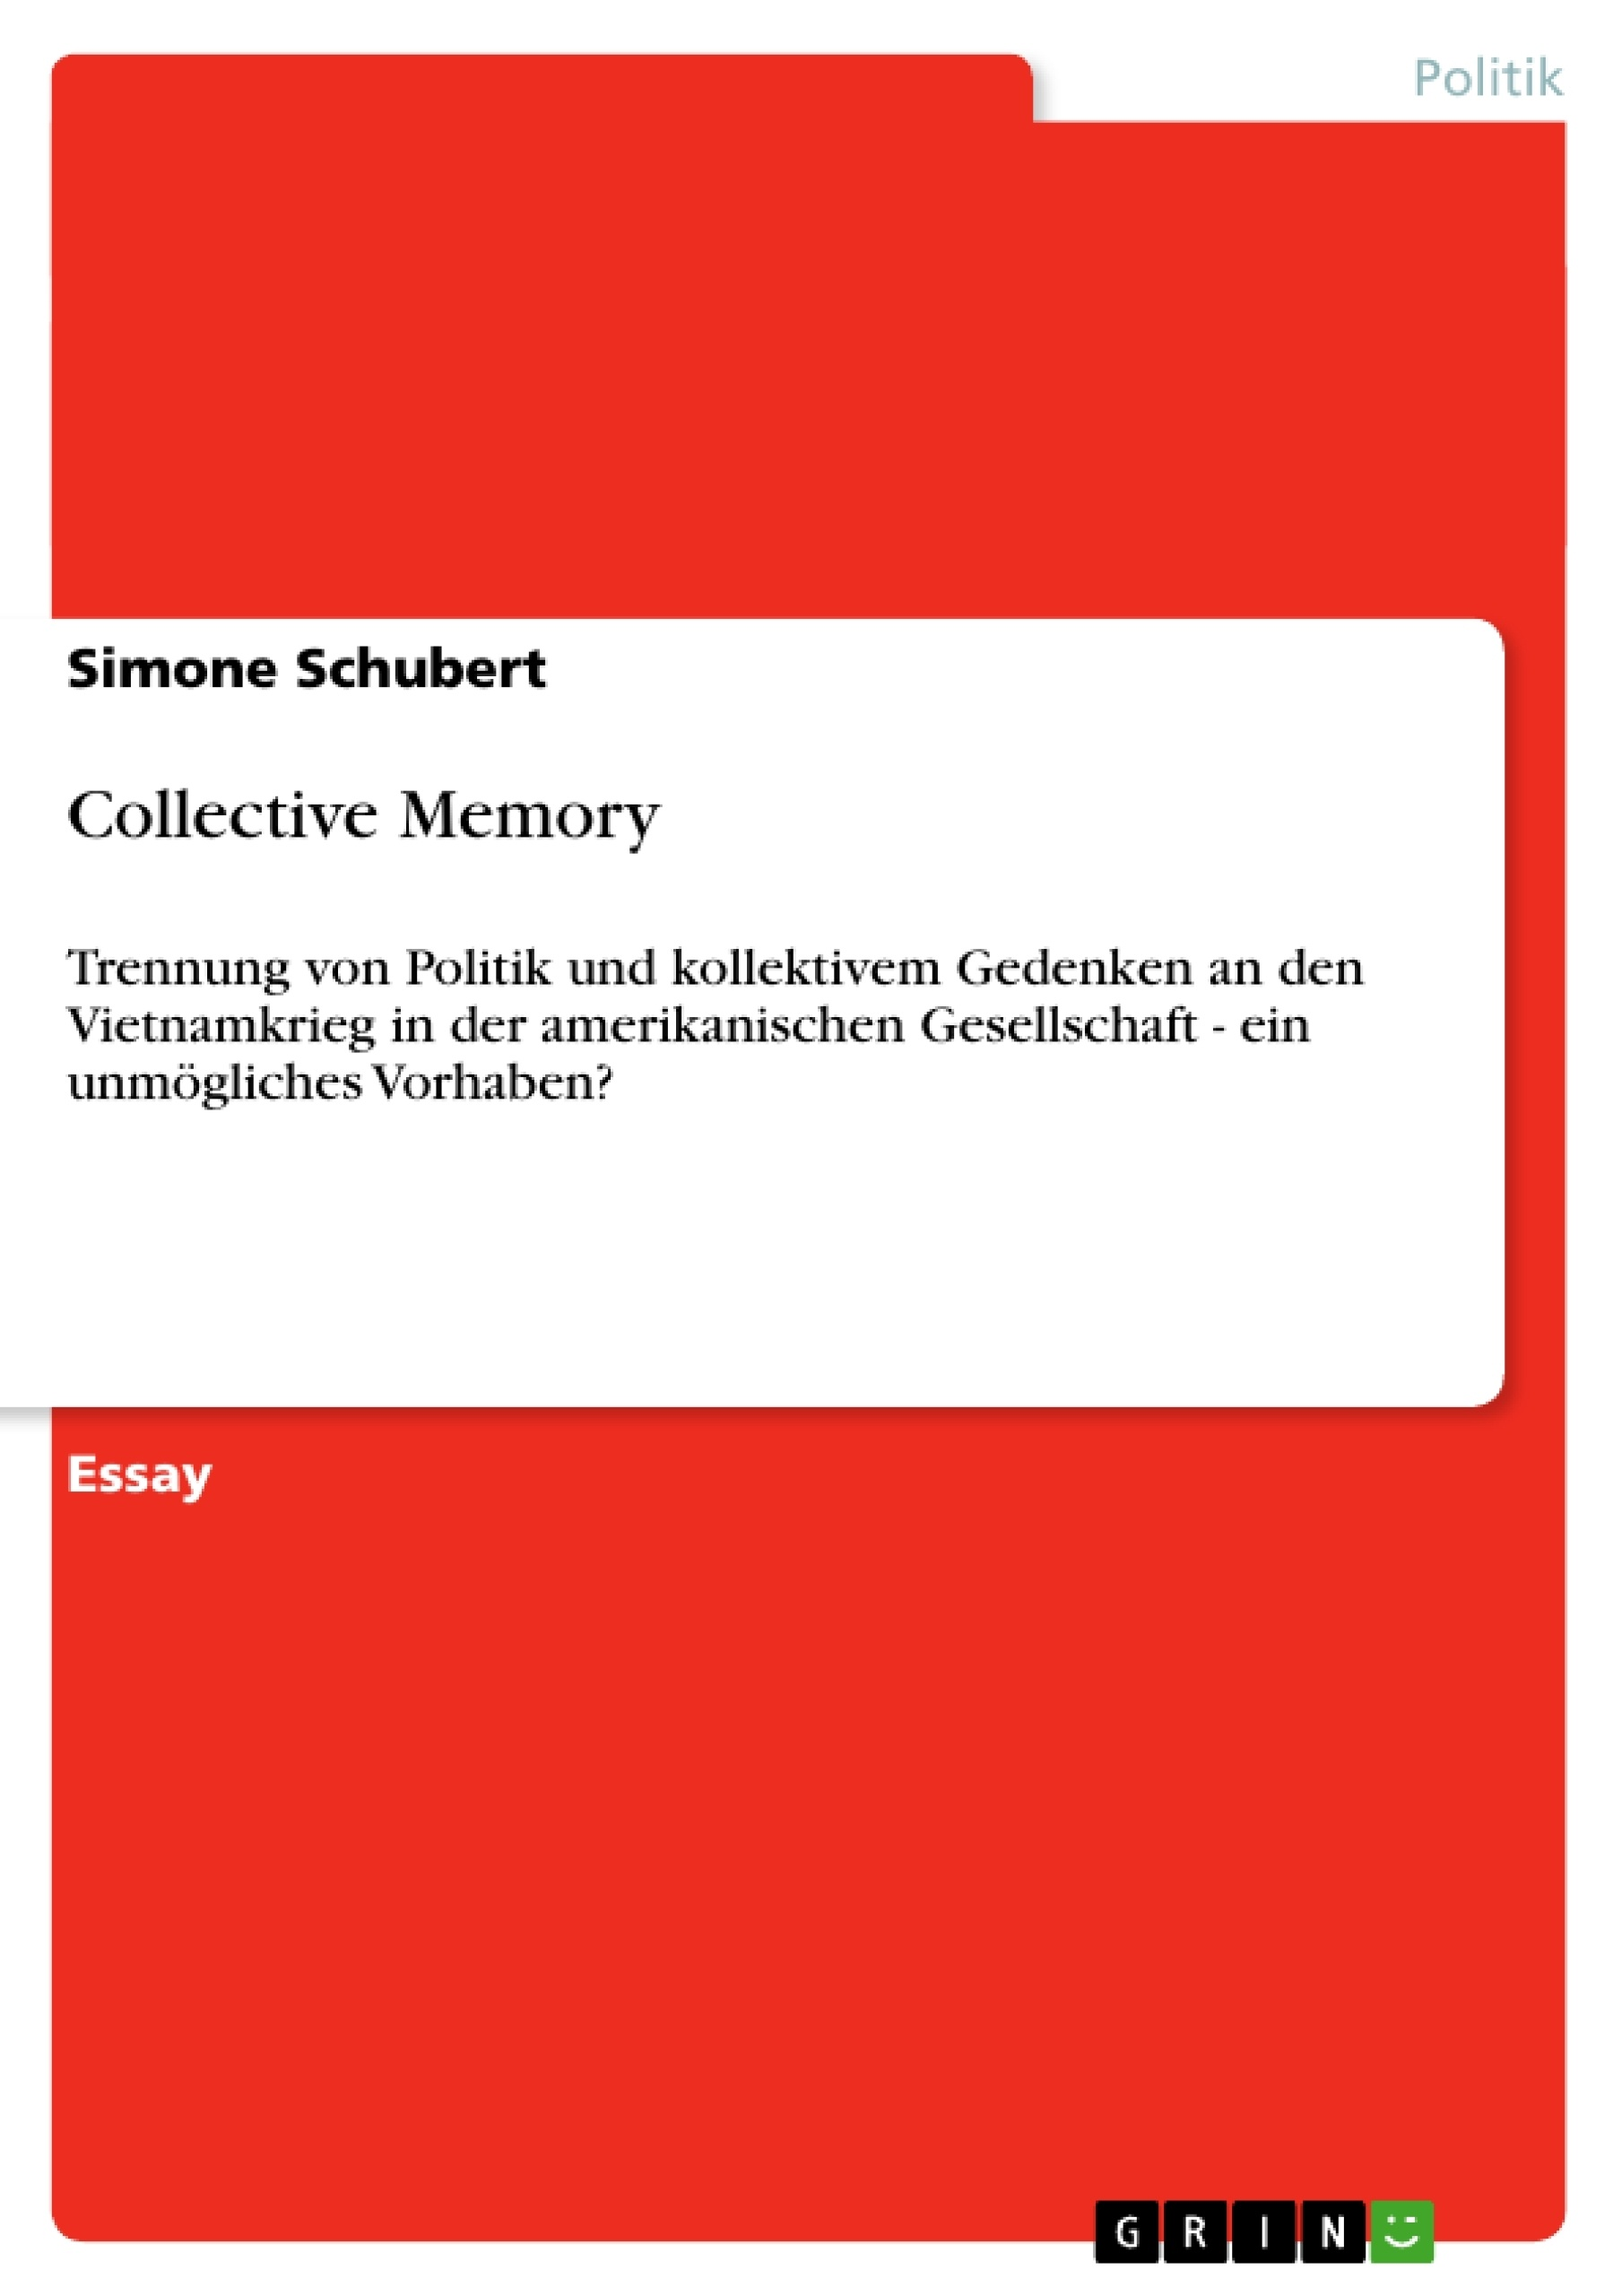 Titel: Collective Memory